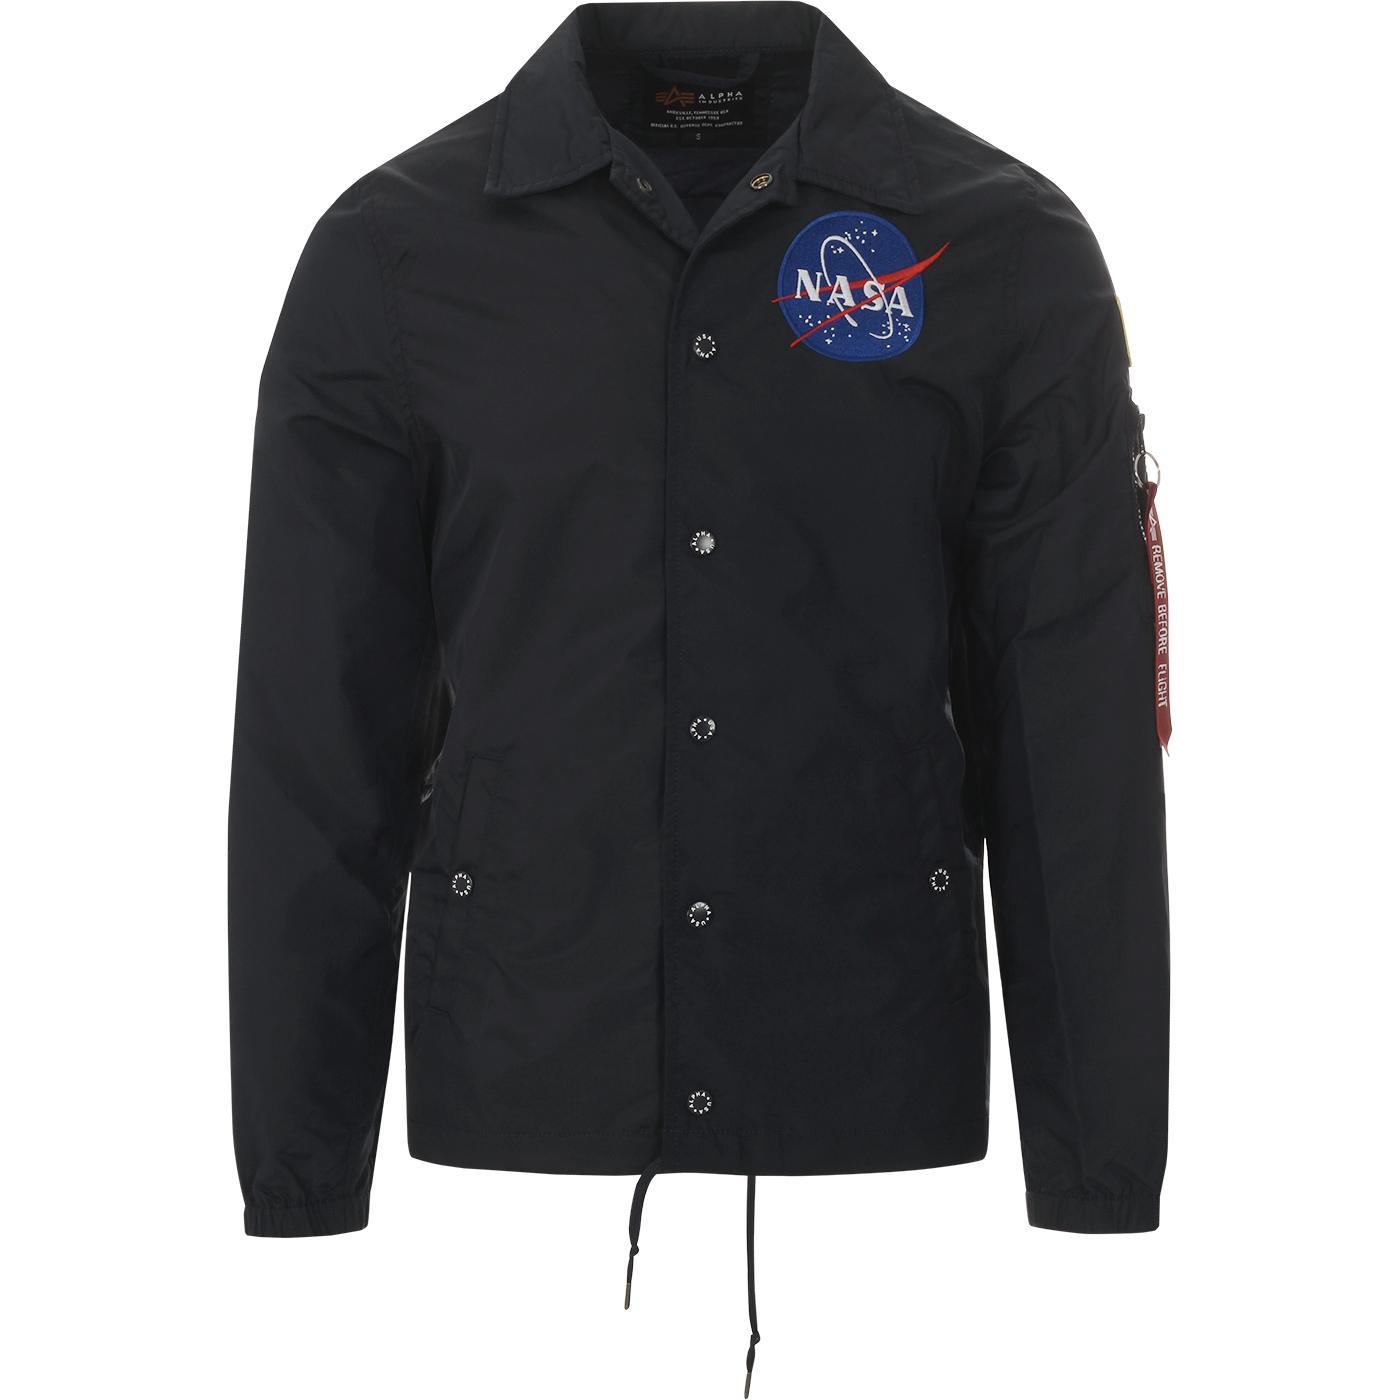 ALPHA INDUSTRIES x NASA Retro Coaches Jacket (RB)